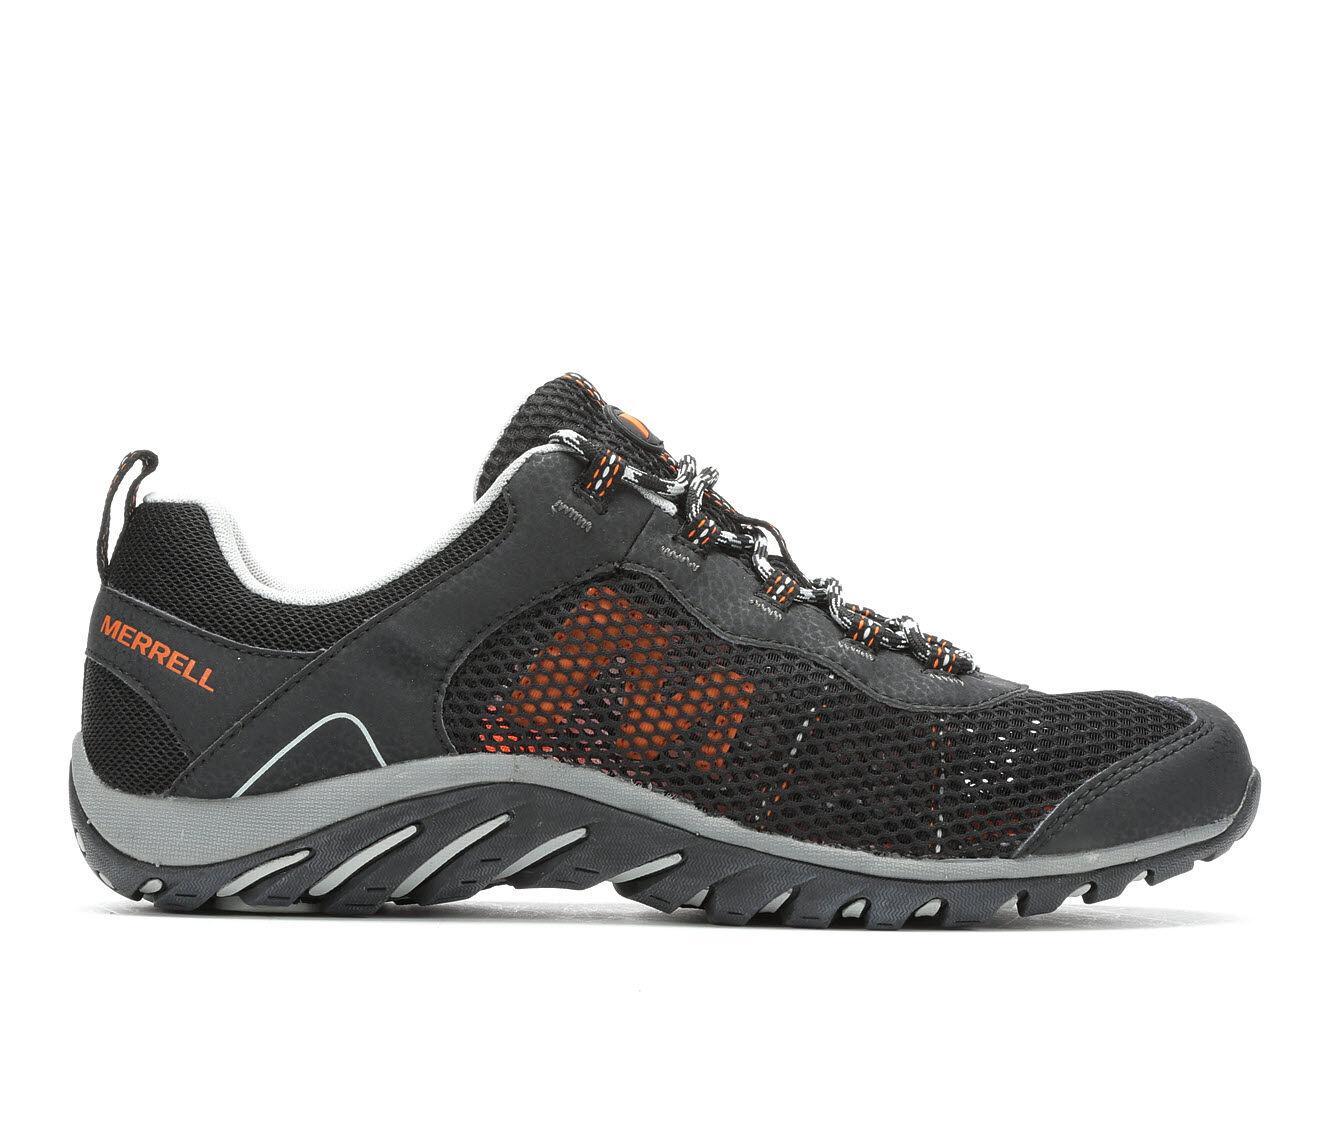 uk shoes_kd1278